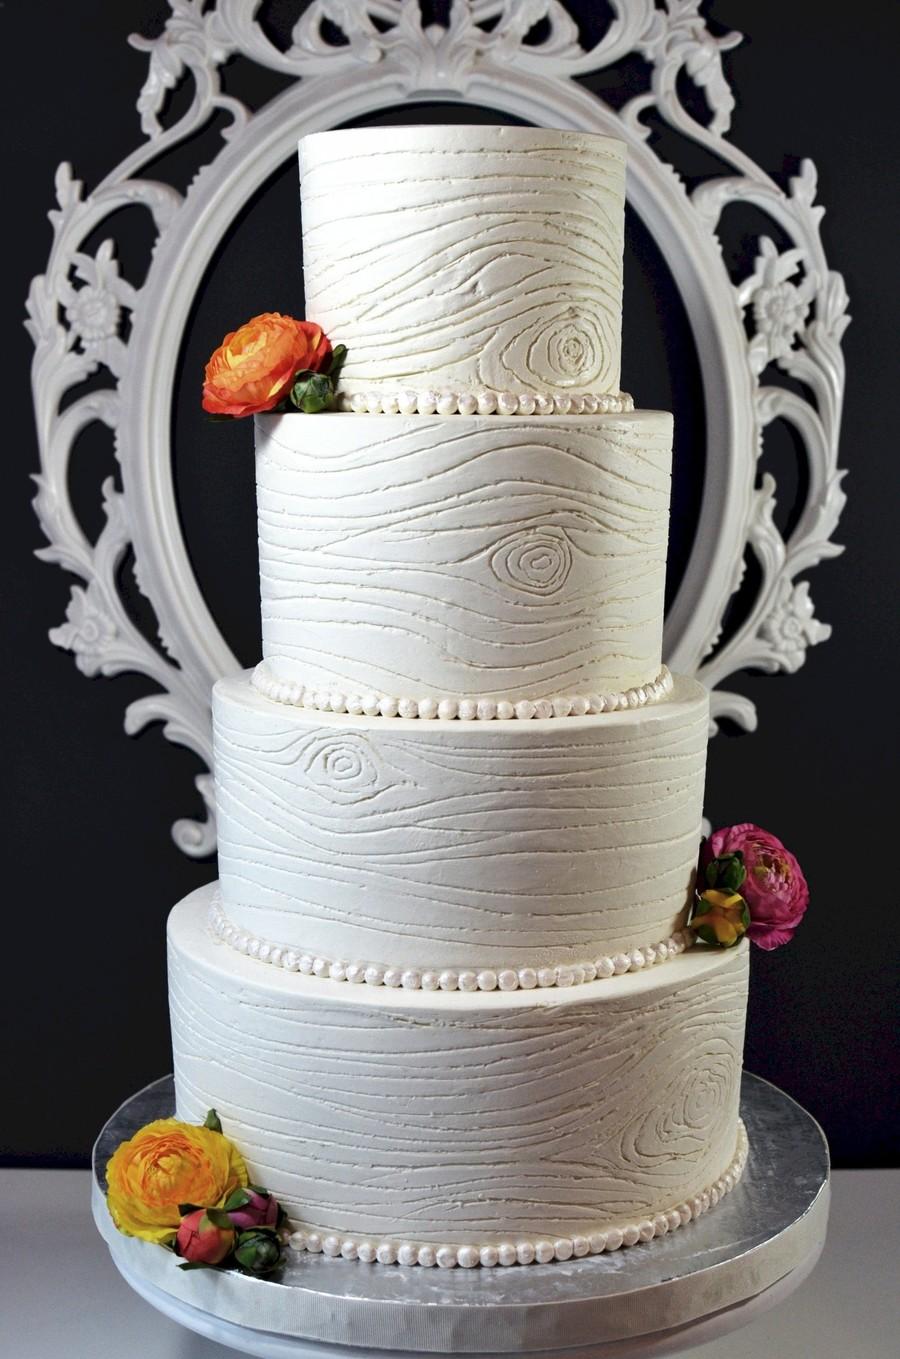 900_67439163fq_buttercream-woodgrain-wedding-cake